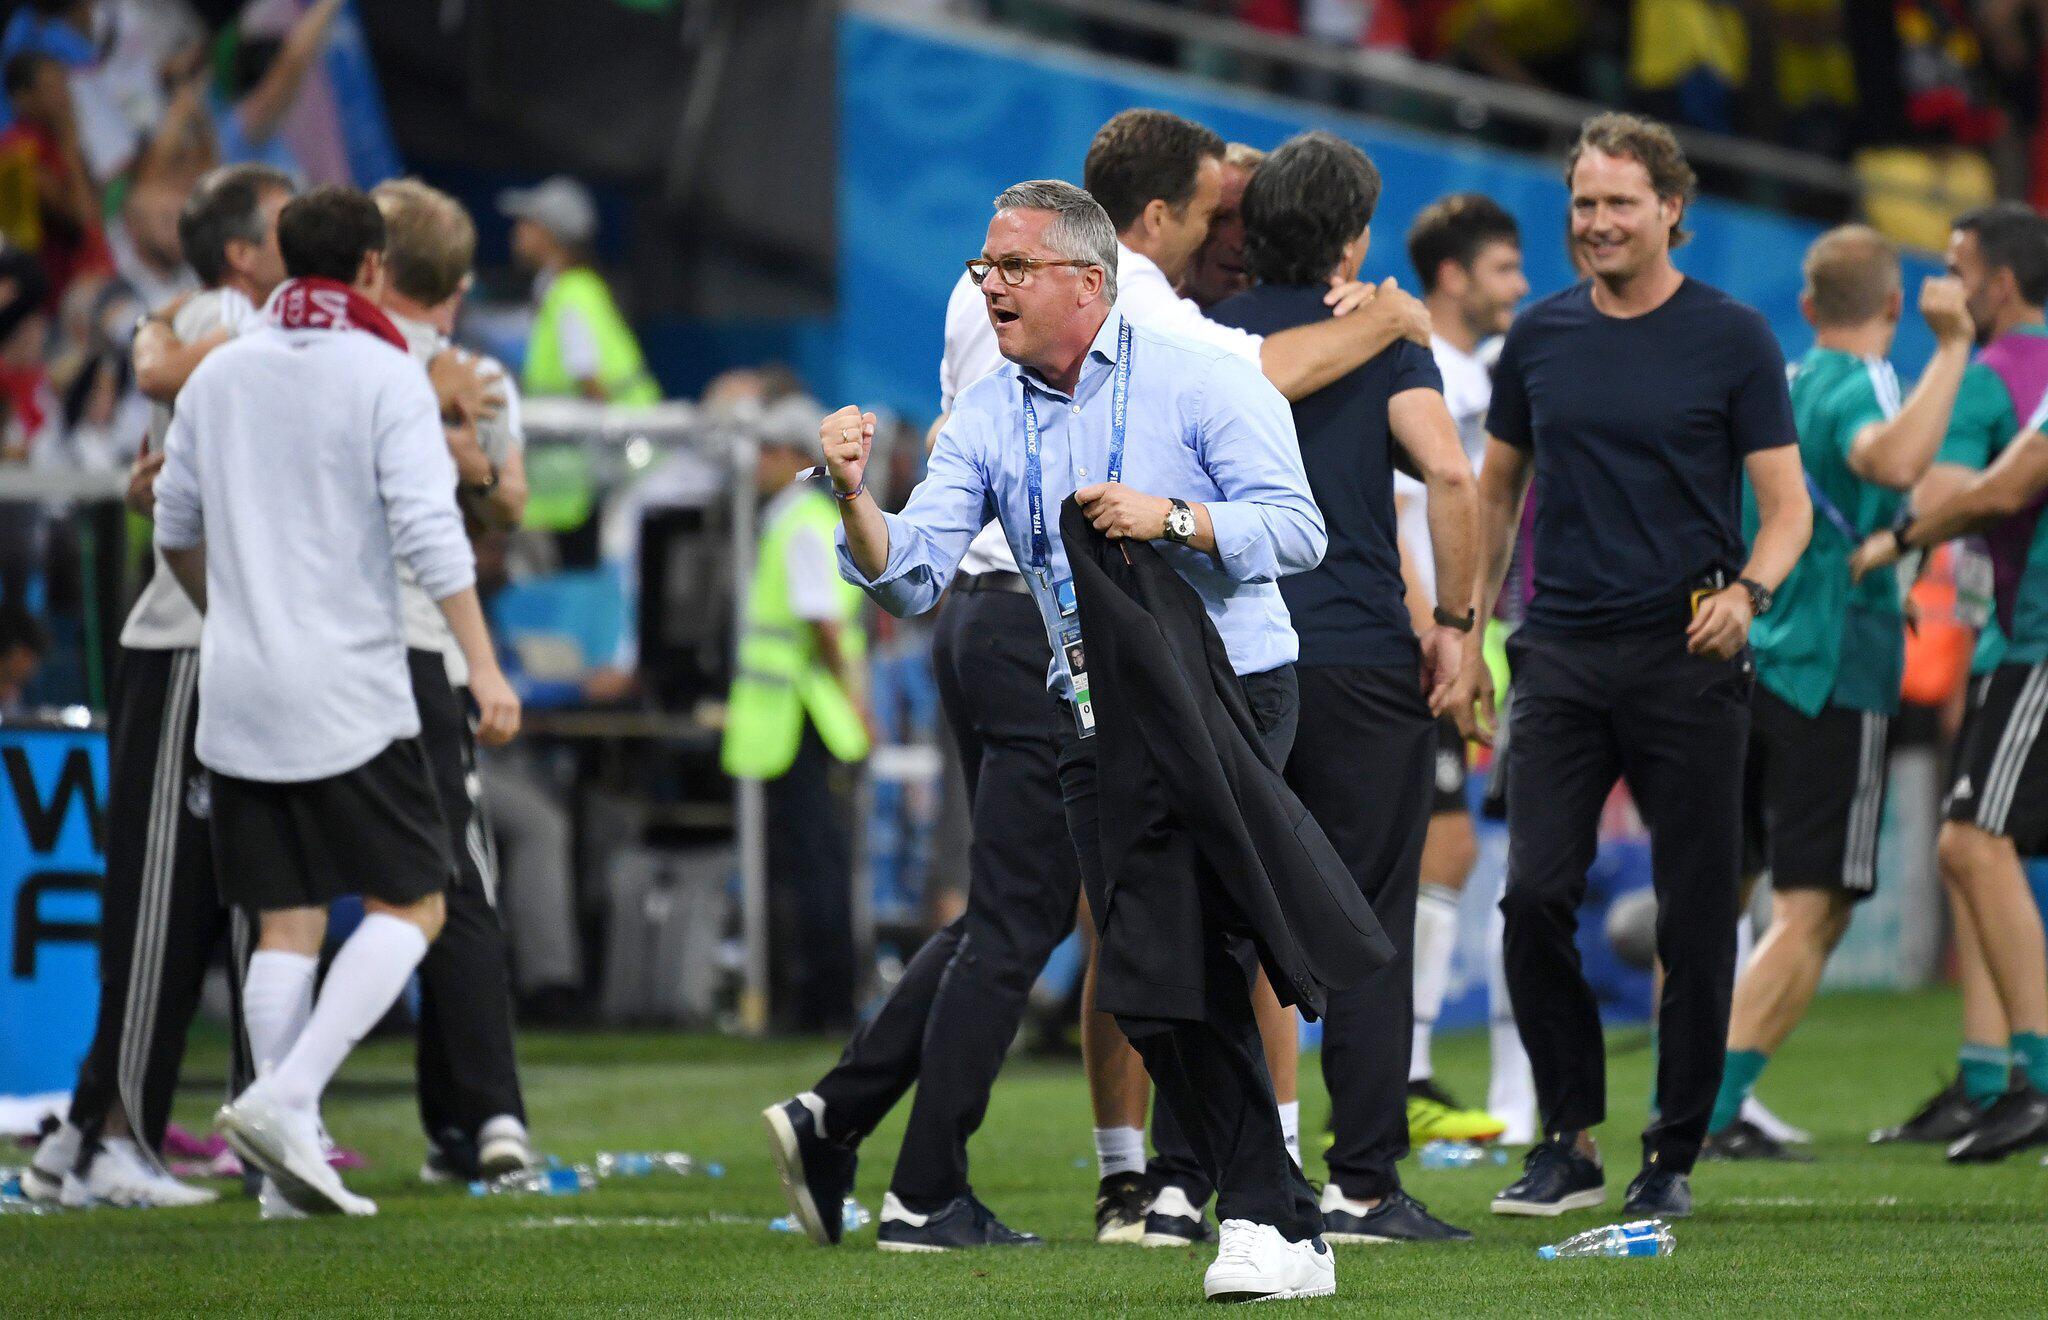 Bild zu FIFA World Cup 2018 - Germany vs Sweden